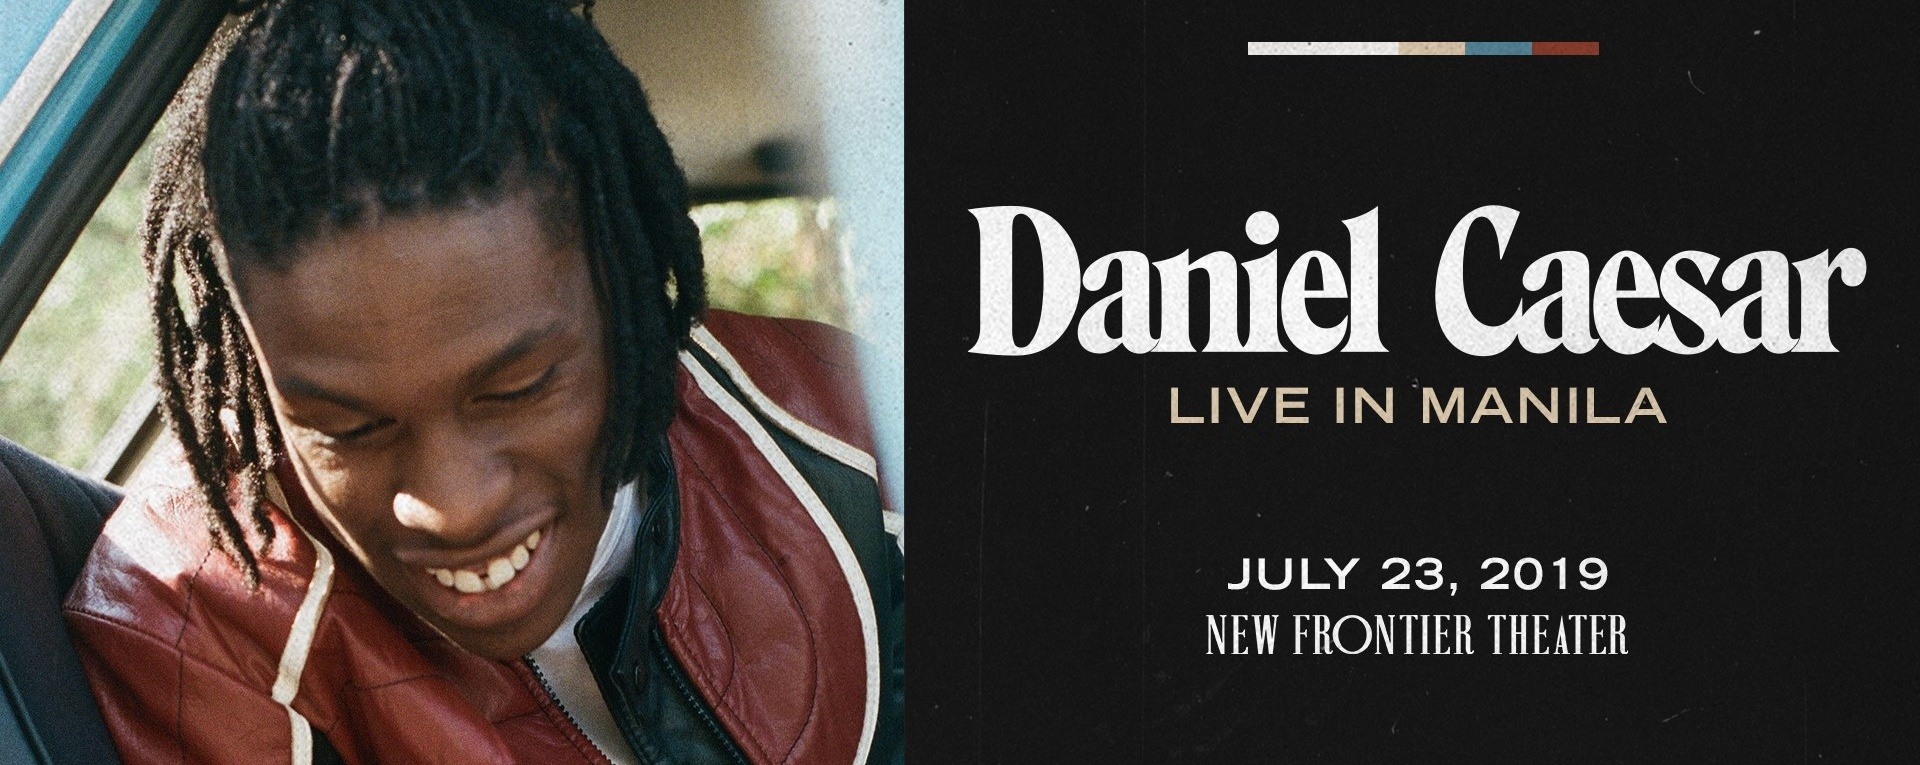 Daniel Caesar: Live in Manila